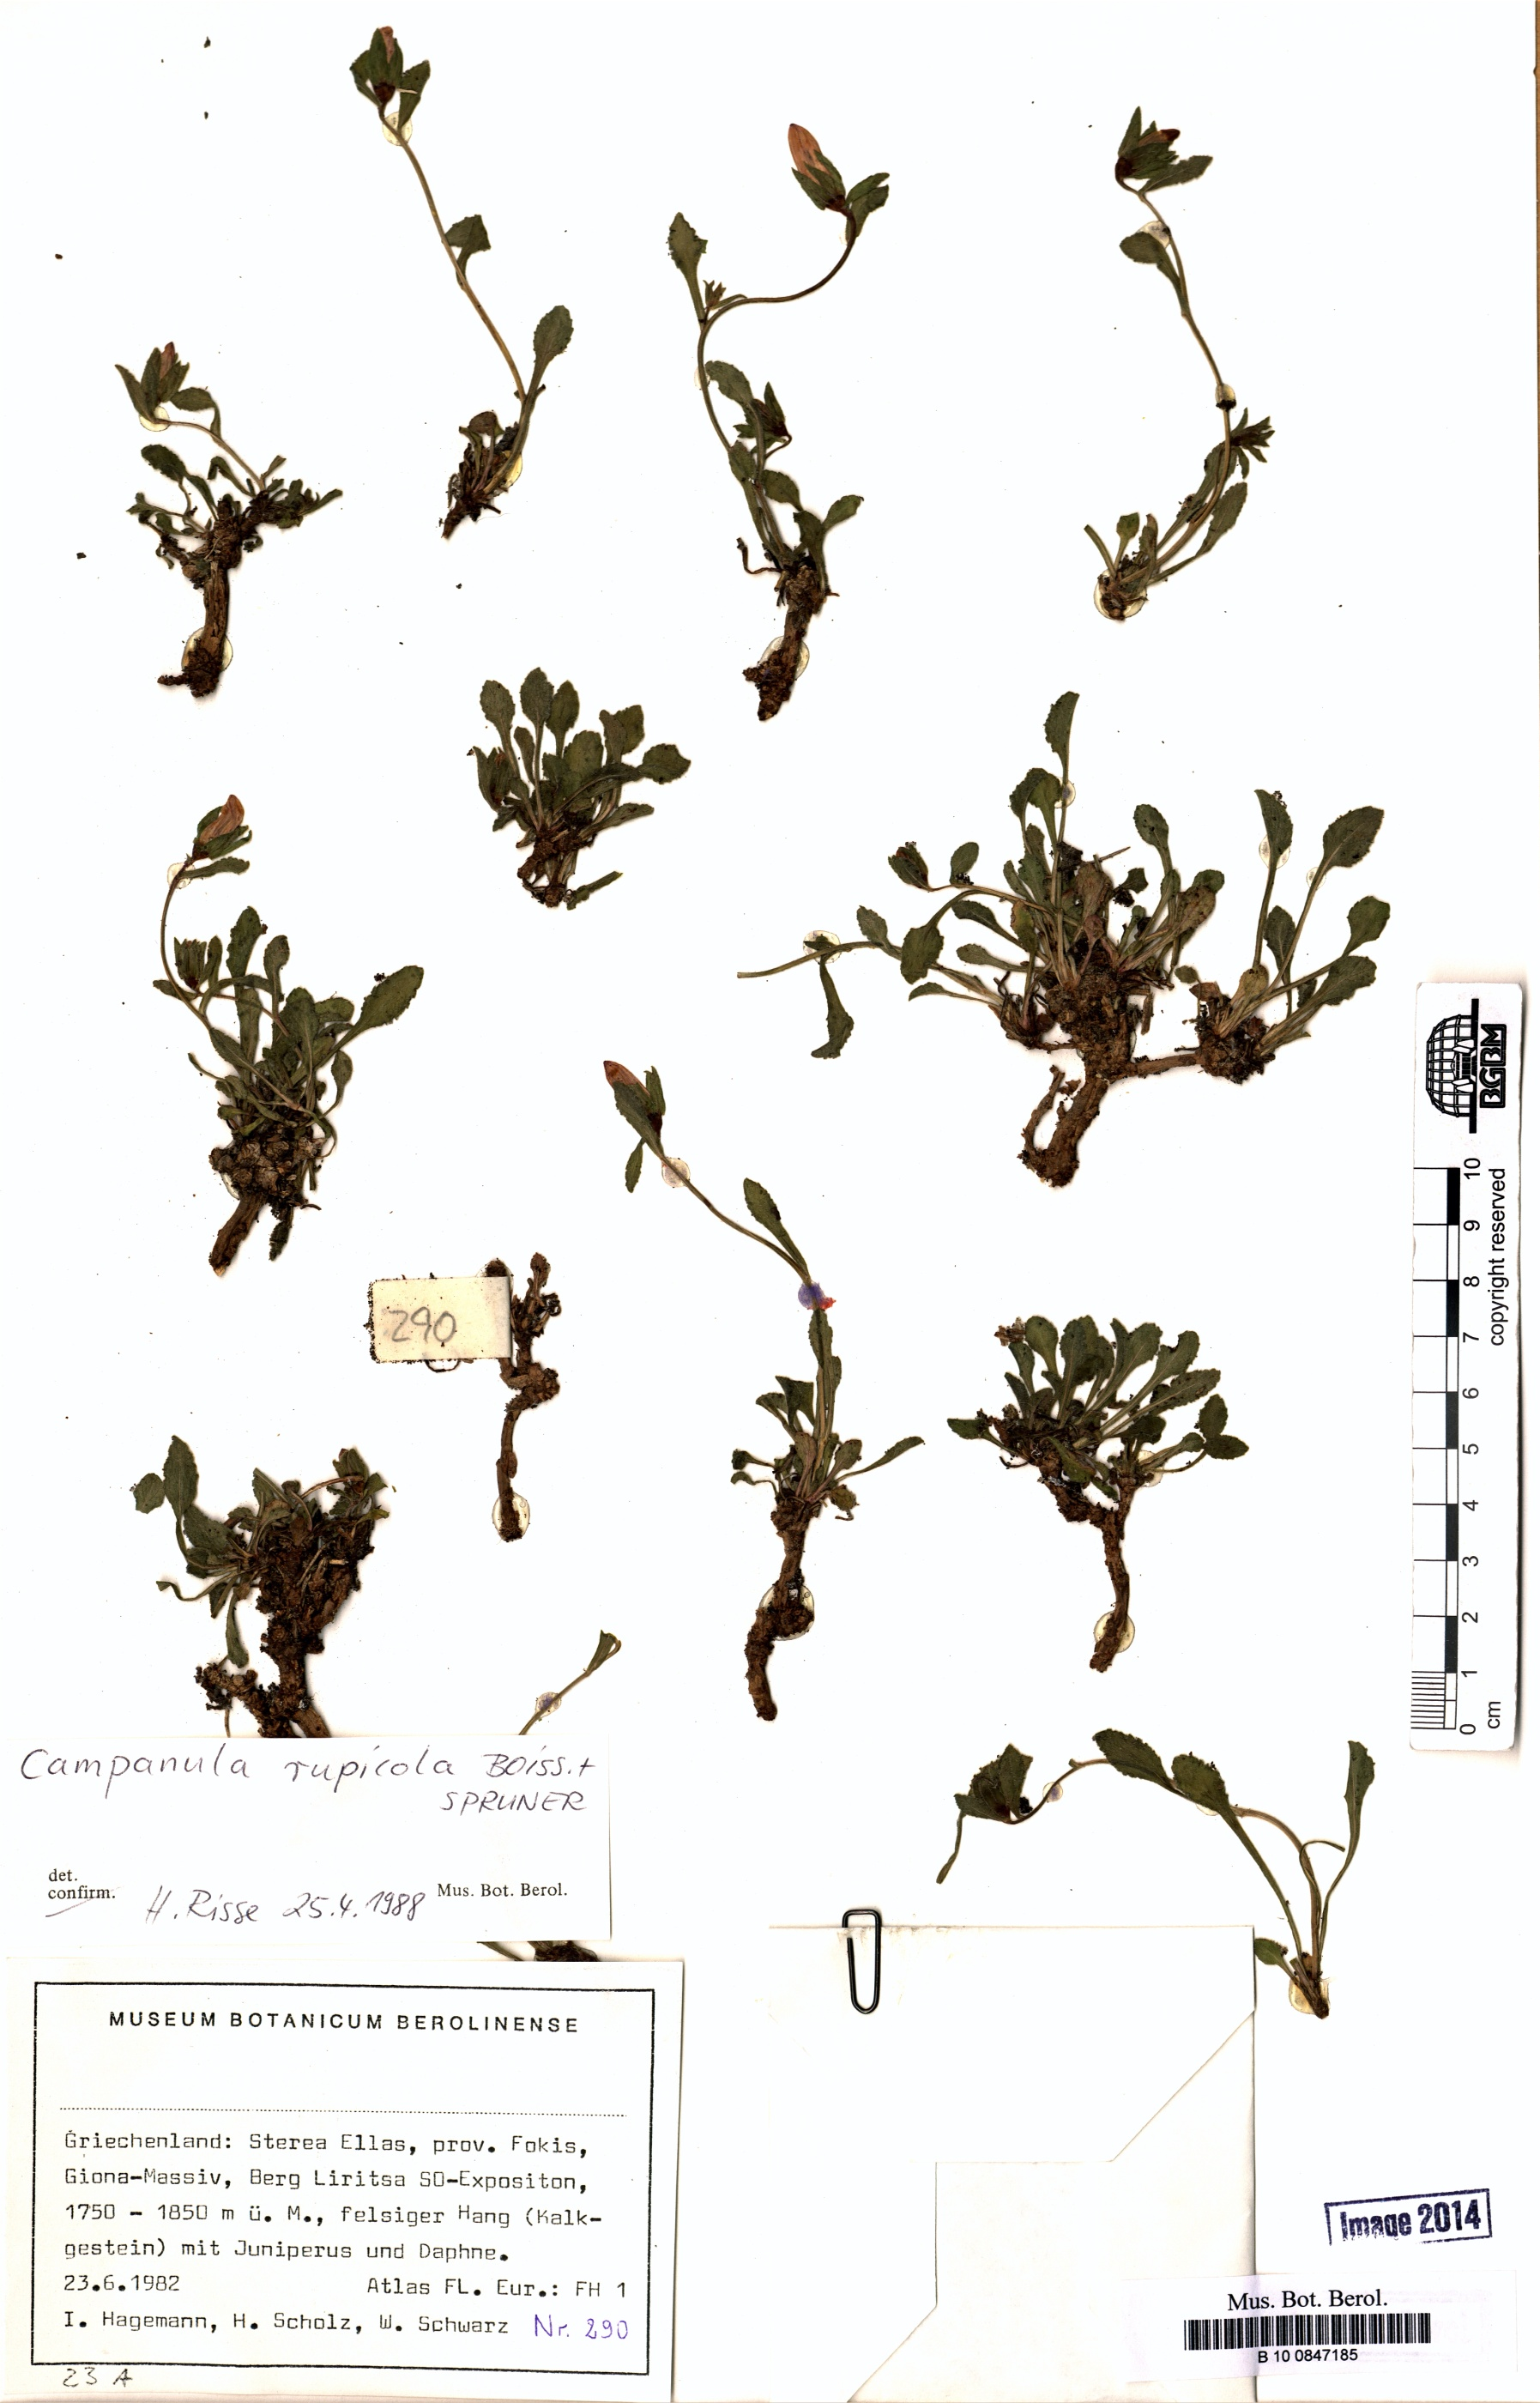 http://ww2.bgbm.org/herbarium/images/B/10/08/47/18/B_10_0847185.jpg